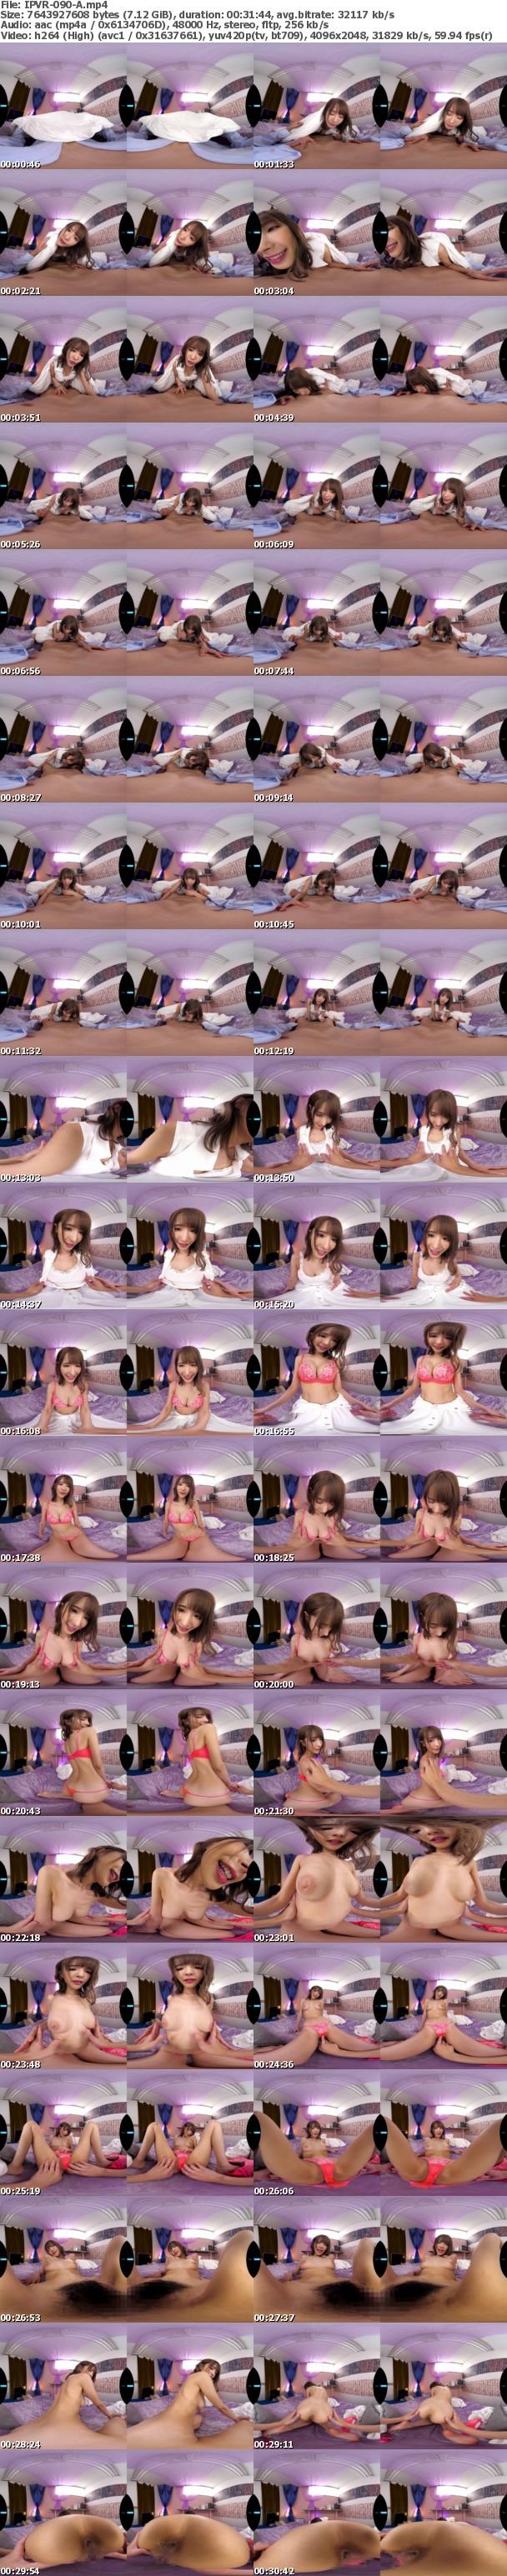 (VR) IPVR-090 セックス大好きボクの彼女・桃乃木かなのおねだりが可愛すぎて朝から晩までノンストップ絶倫性交VR 合計6射精!結果、精子底つくまで搾り取られた…(嬉)